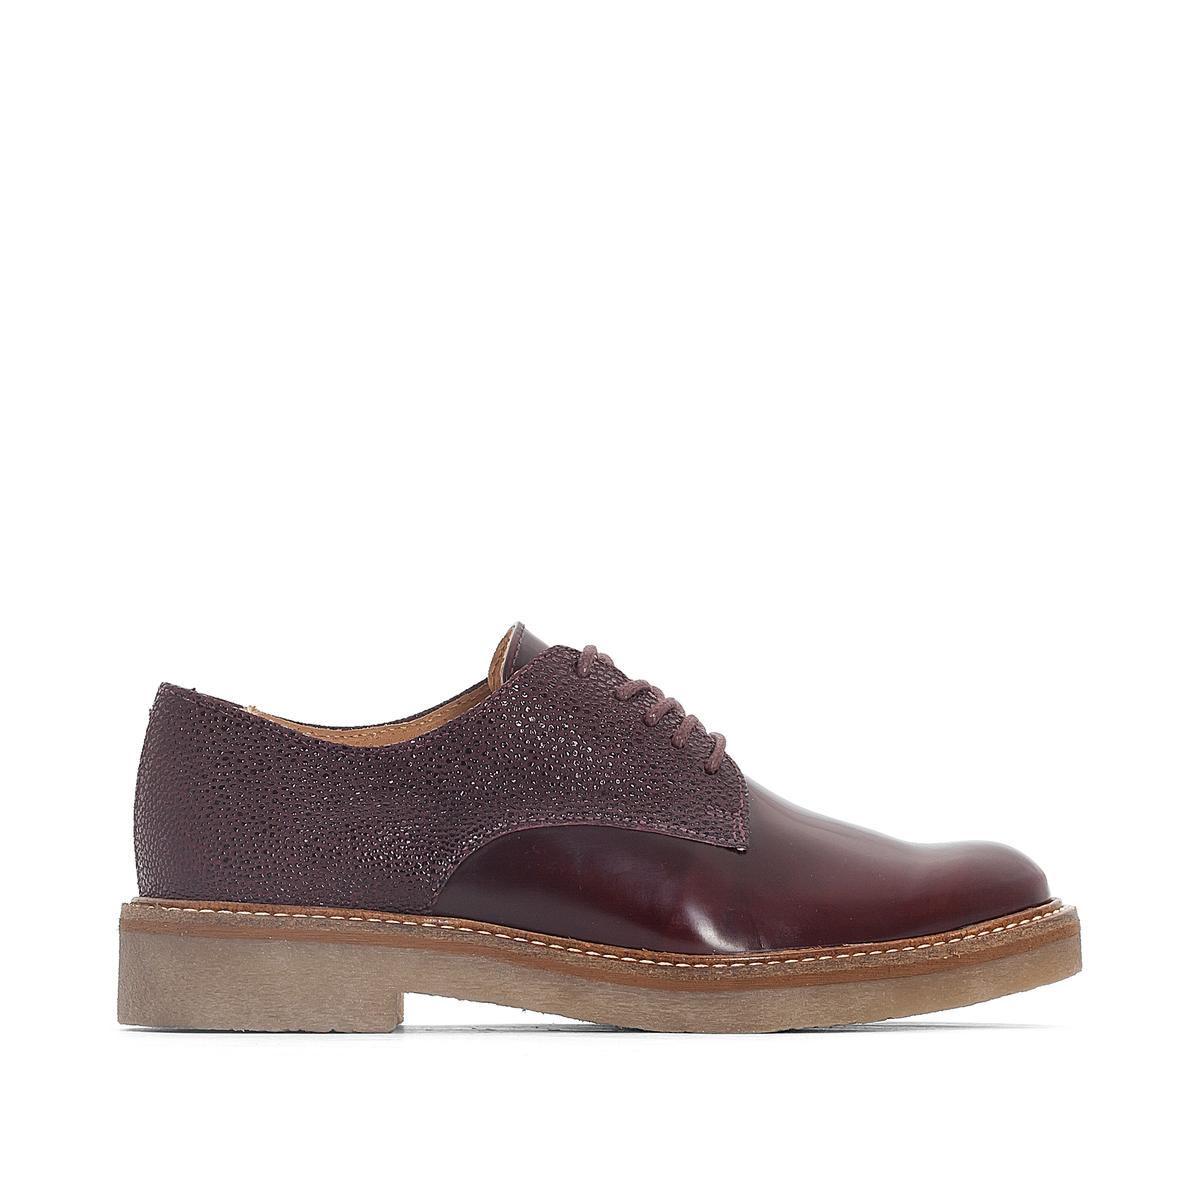 Ботинки-дерби OXFORK ботинки дерби